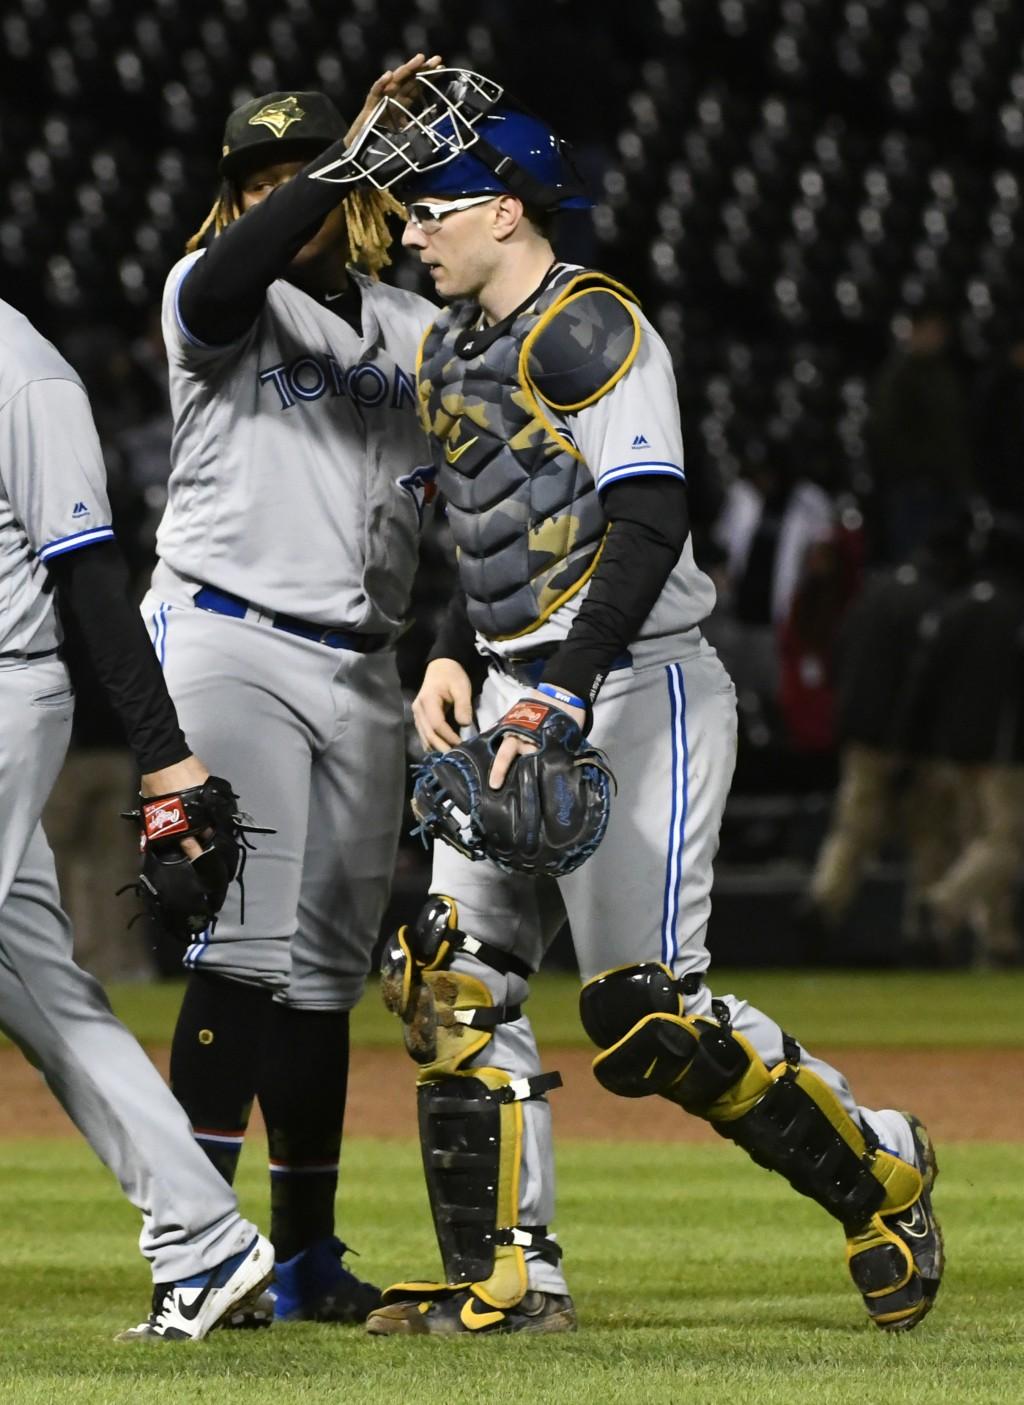 Toronto Blue Jays third baseman Vladimir Guerrero Jr., left, and catcher Danny Jansen celebrate after the team's baseball game against the Chicago Whi